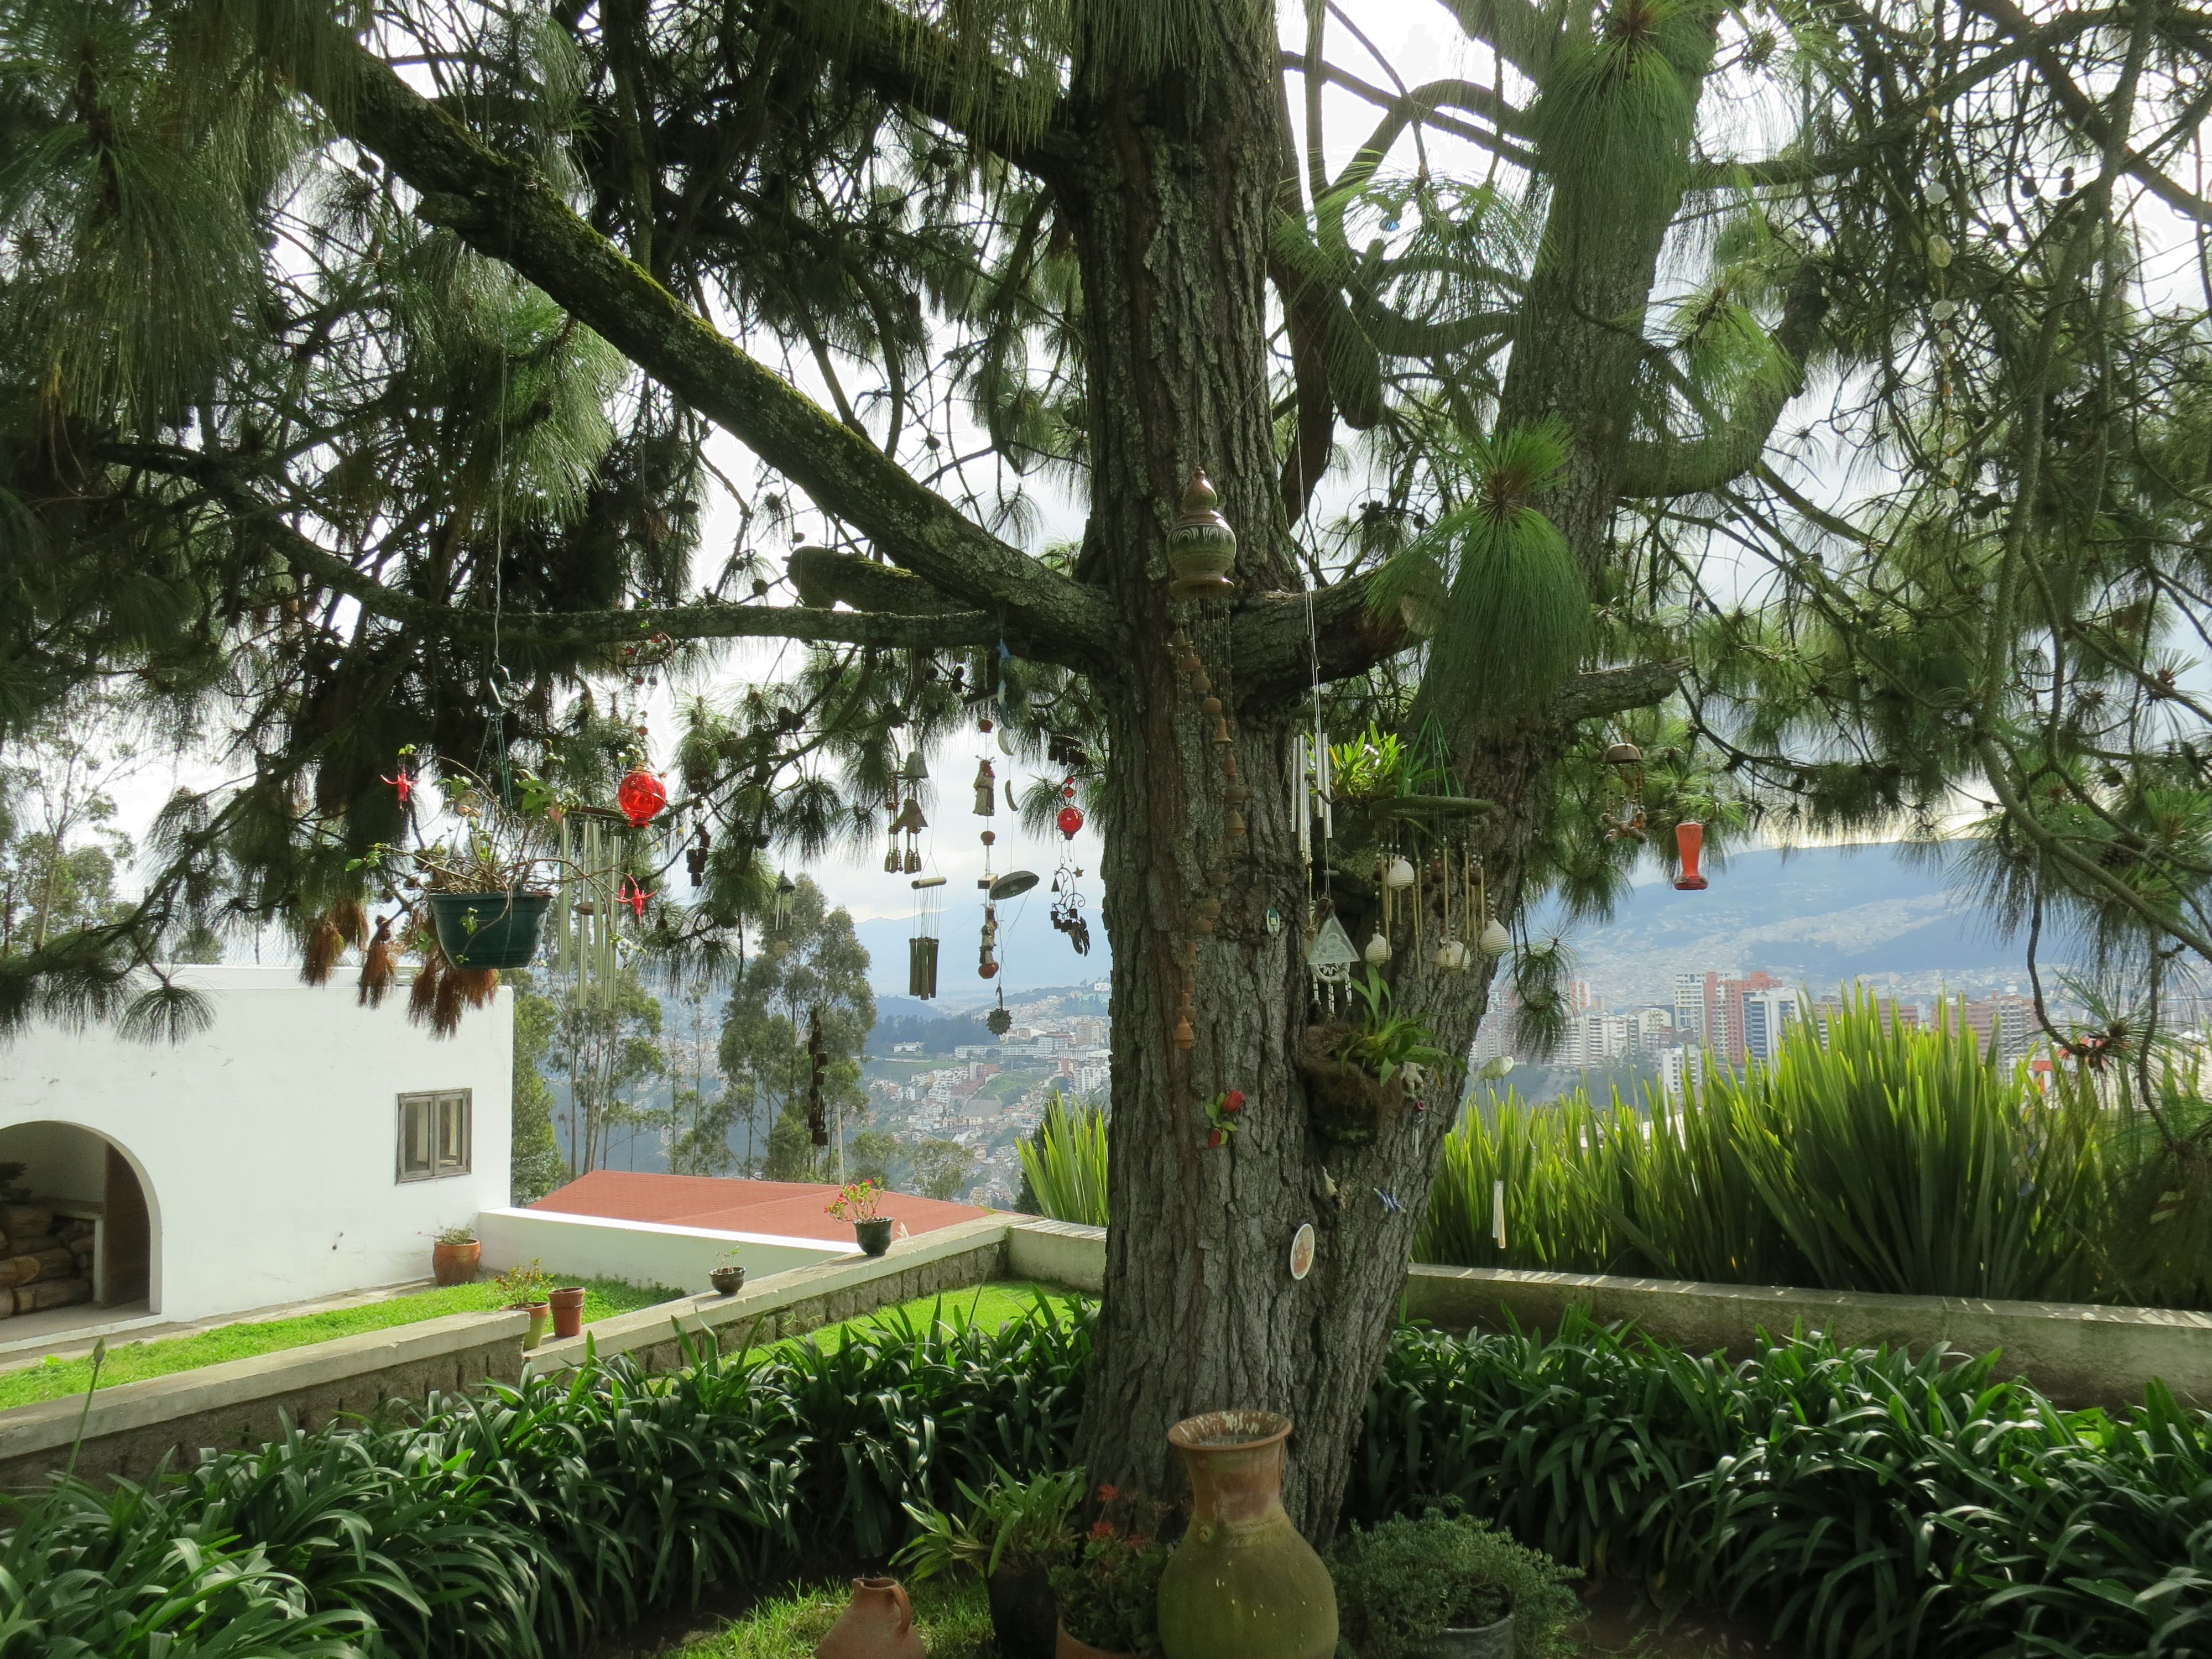 An Artist's Vision Realized: Guayasamín's Capilla del ...